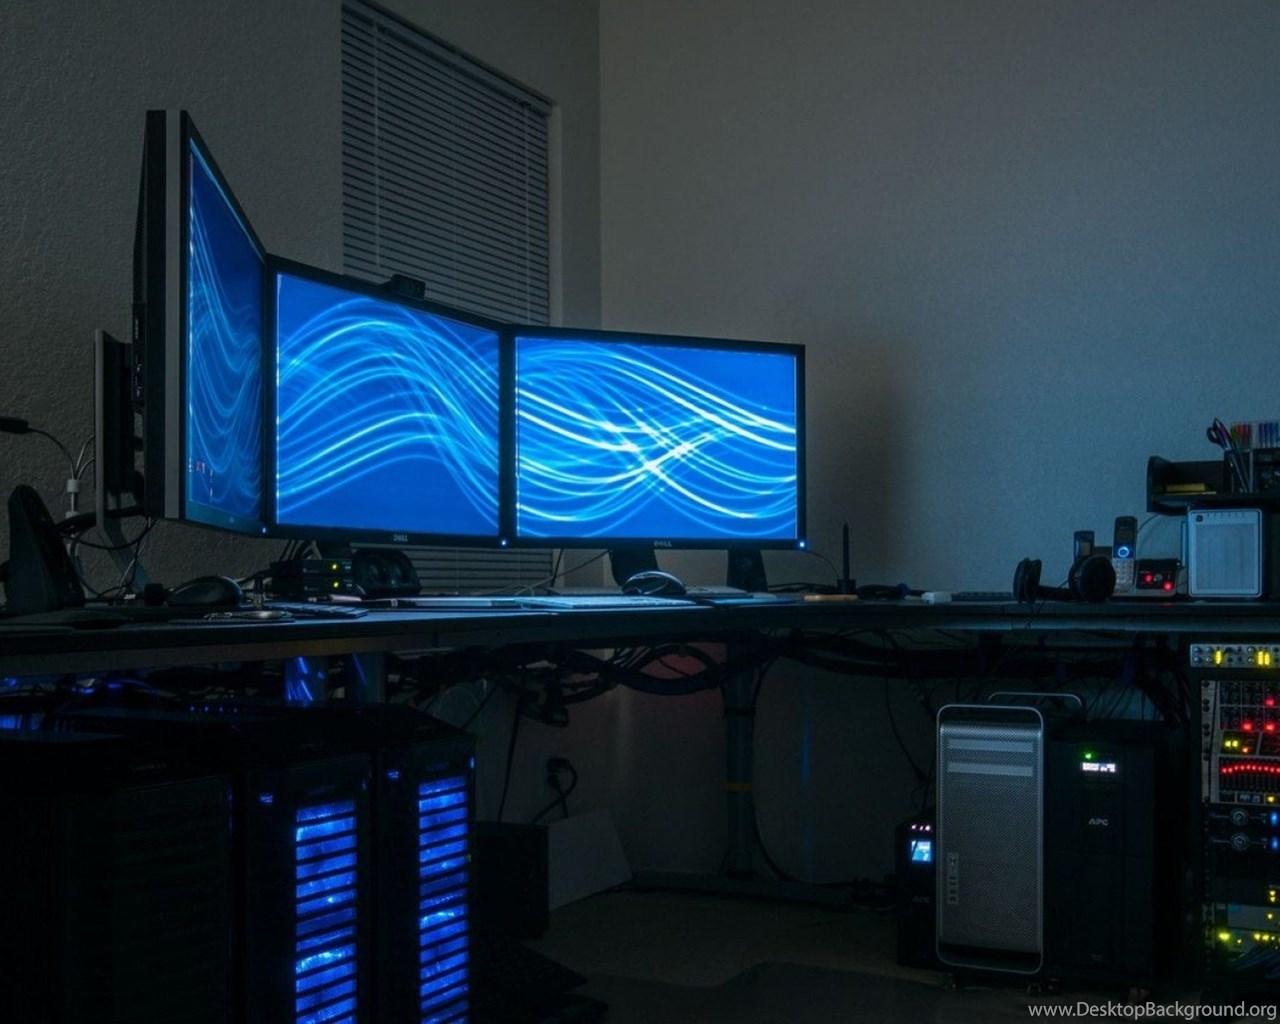 Gaming Computers Wallpapers Walldevil Best Free Hd Desktop And Desktop Background